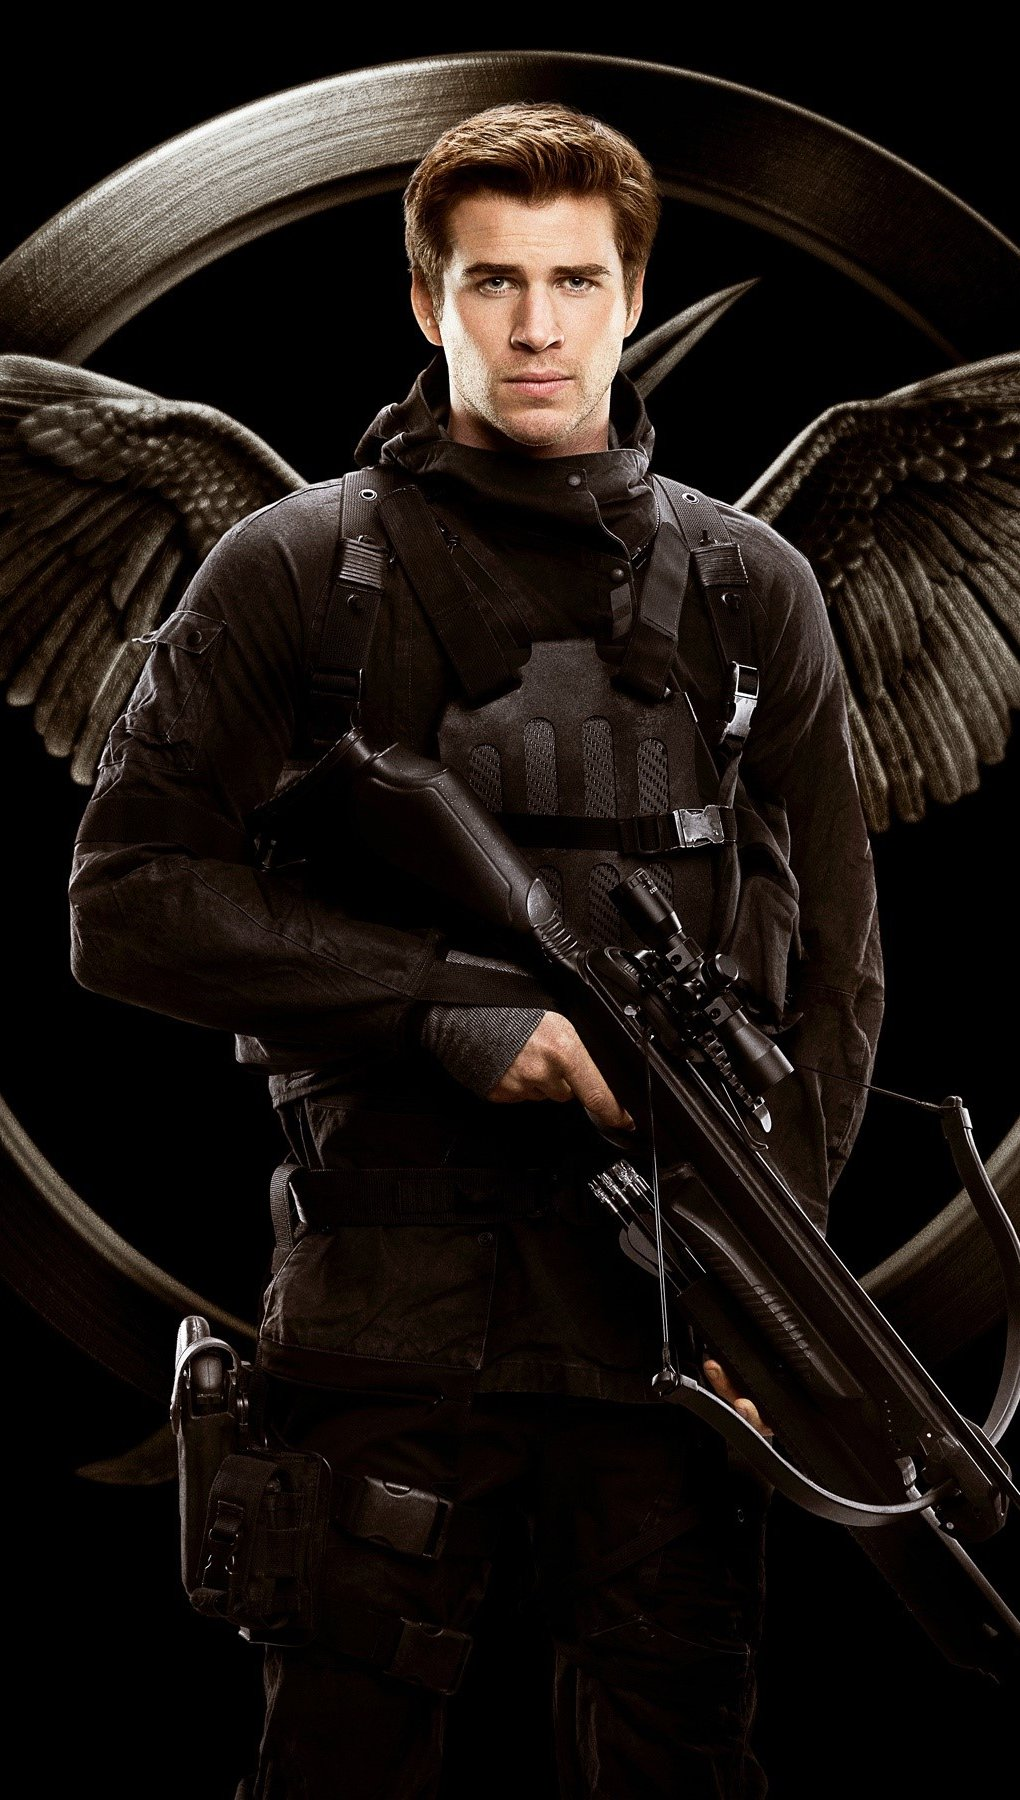 Fondos de pantalla Liam Hemsworth como Gale Hawthorne Vertical